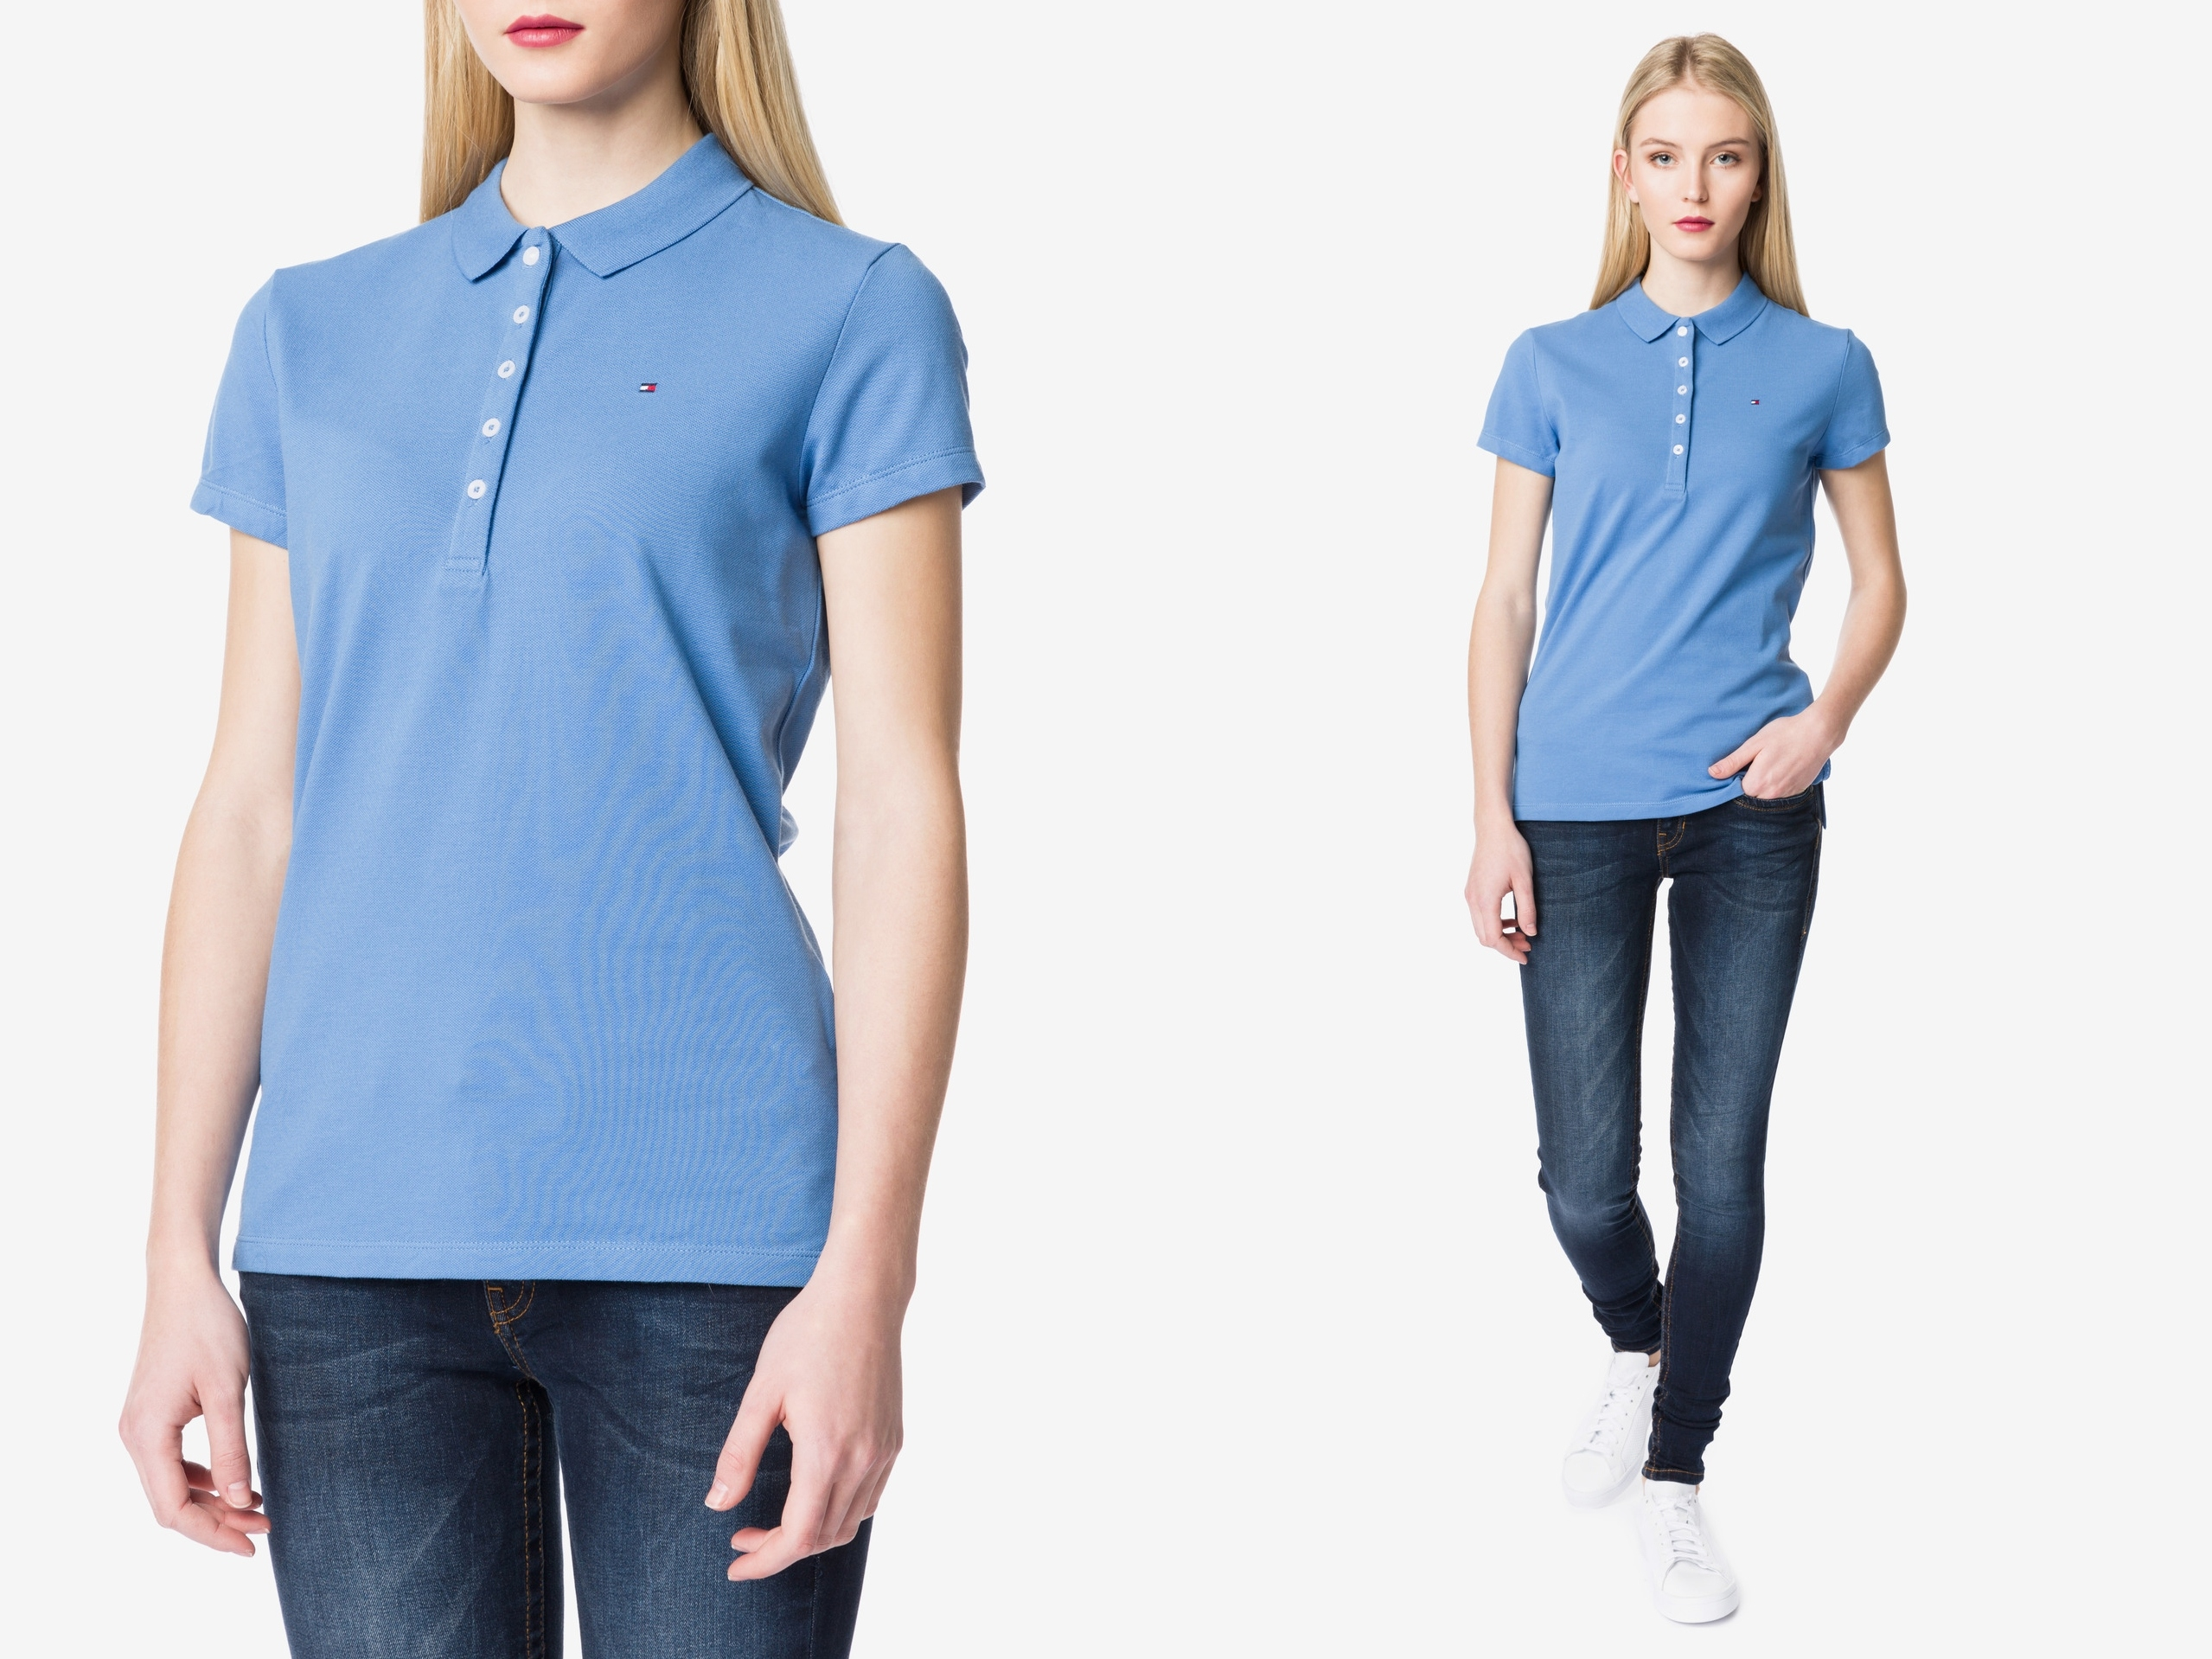 Tommy Hilfiger New Chiara Koszulka Polo Slim fif S